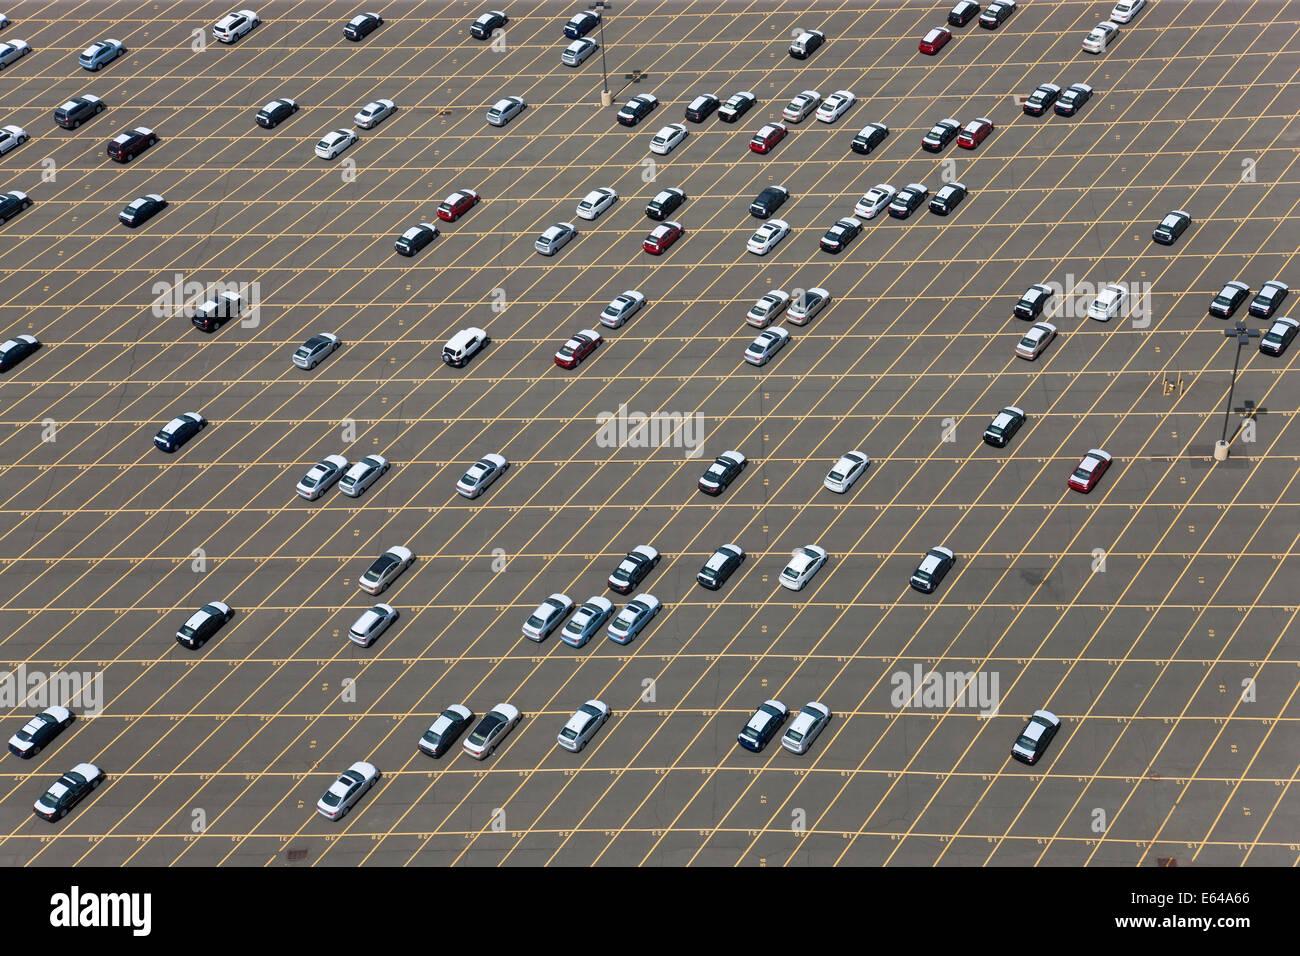 Neue Autos warten auf Lieferung an Port, New Jersey, New York, USA Stockbild